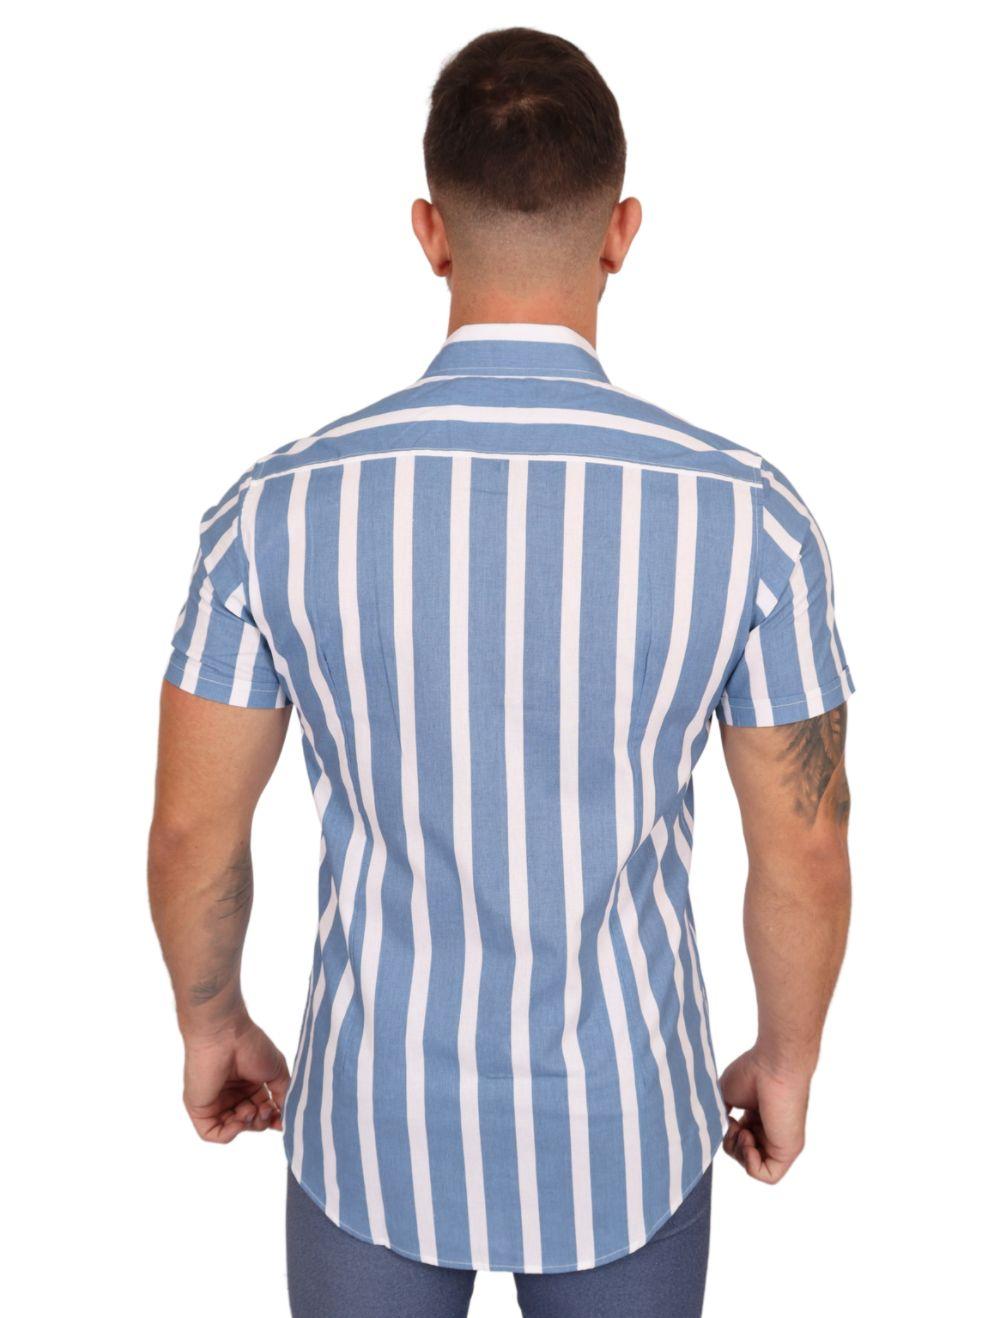 Camisa Masculina Manga Curta Slim Azul Listrada